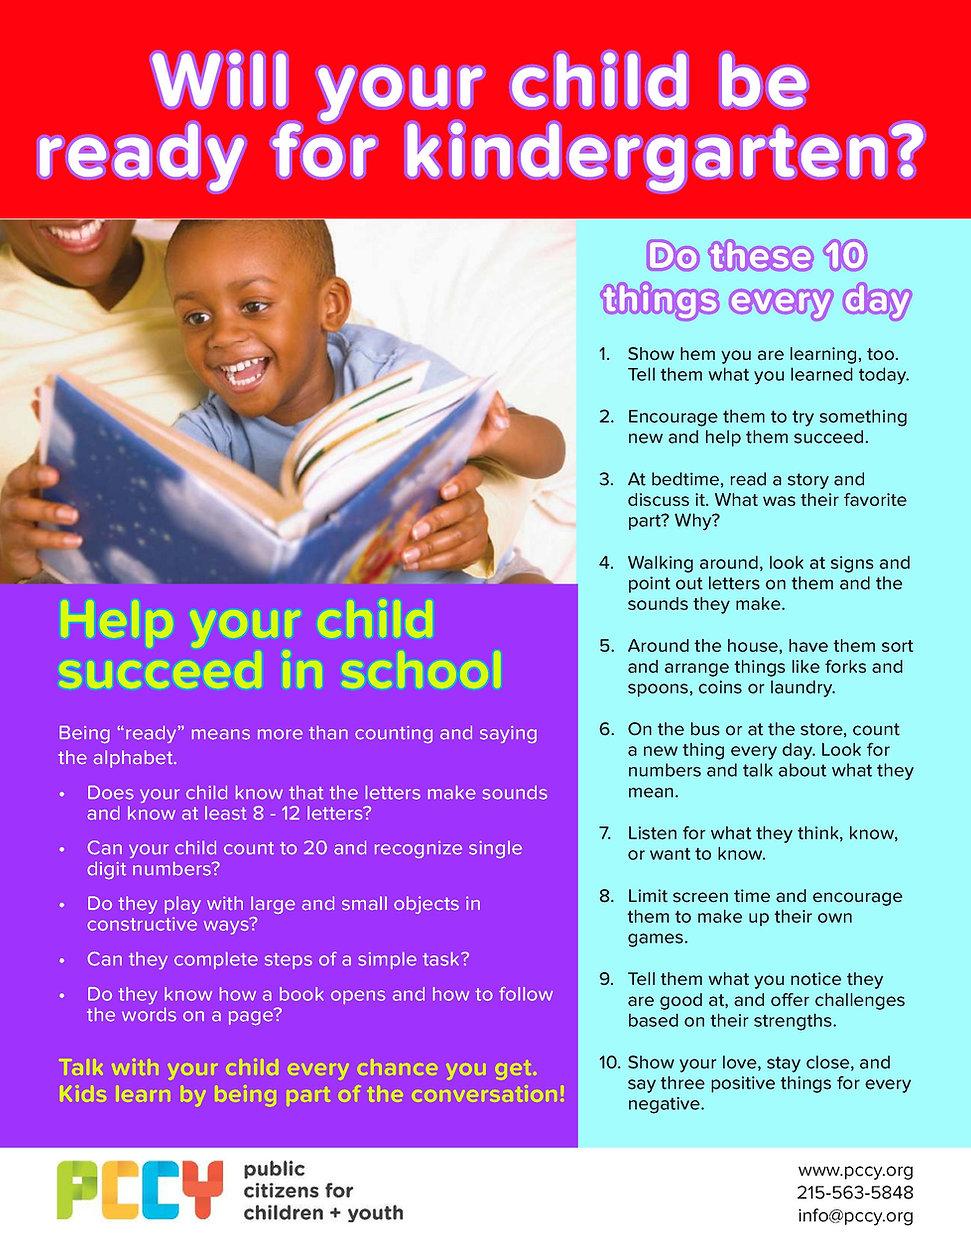 Kindergarten Readiness_1.jpg